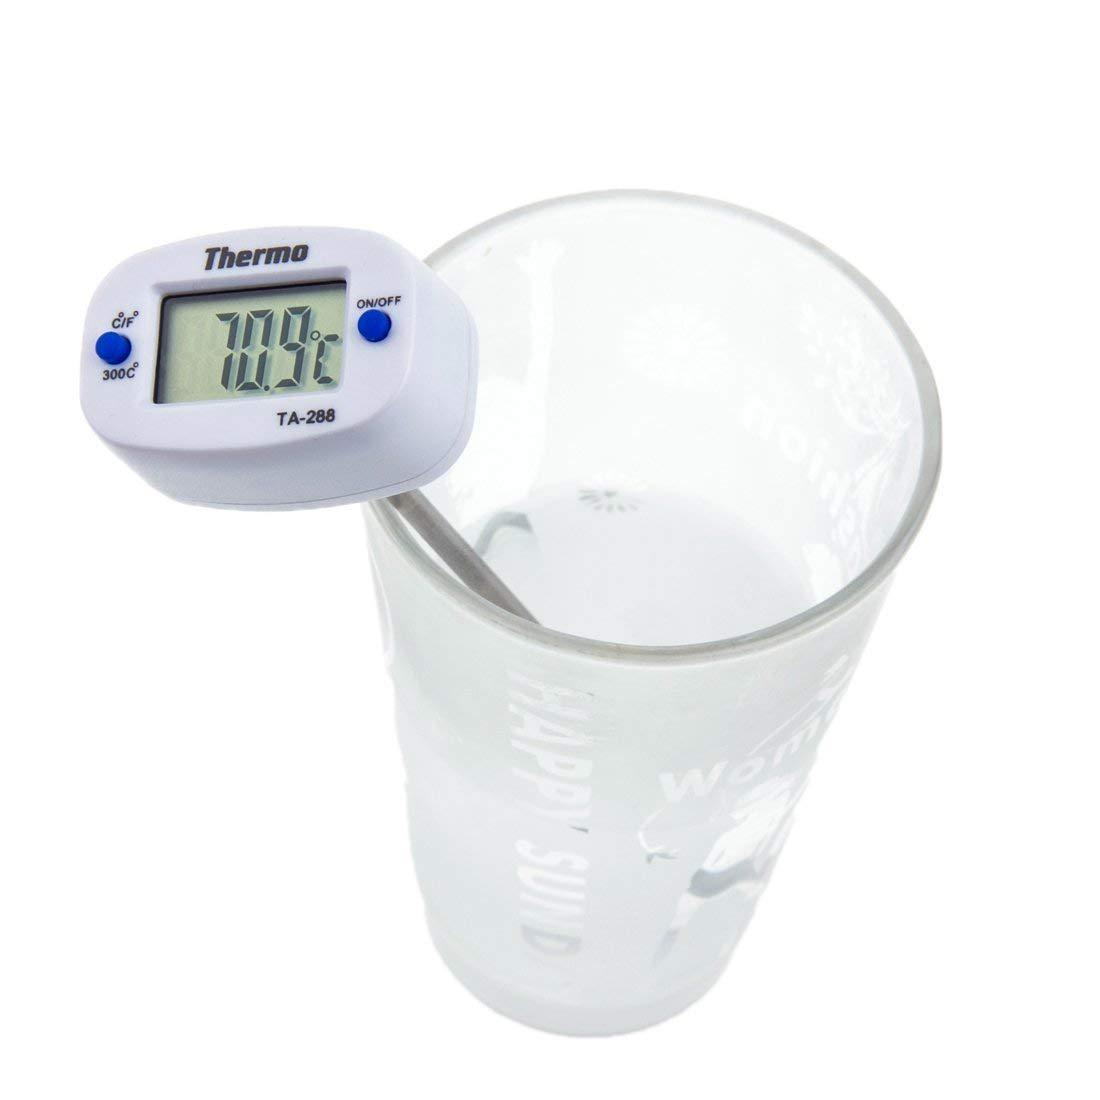 🔝 Кулинарный электронный термометр со щупом Thermo TA-288, Белый, с доставкой по Укриане | 🎁%🚚